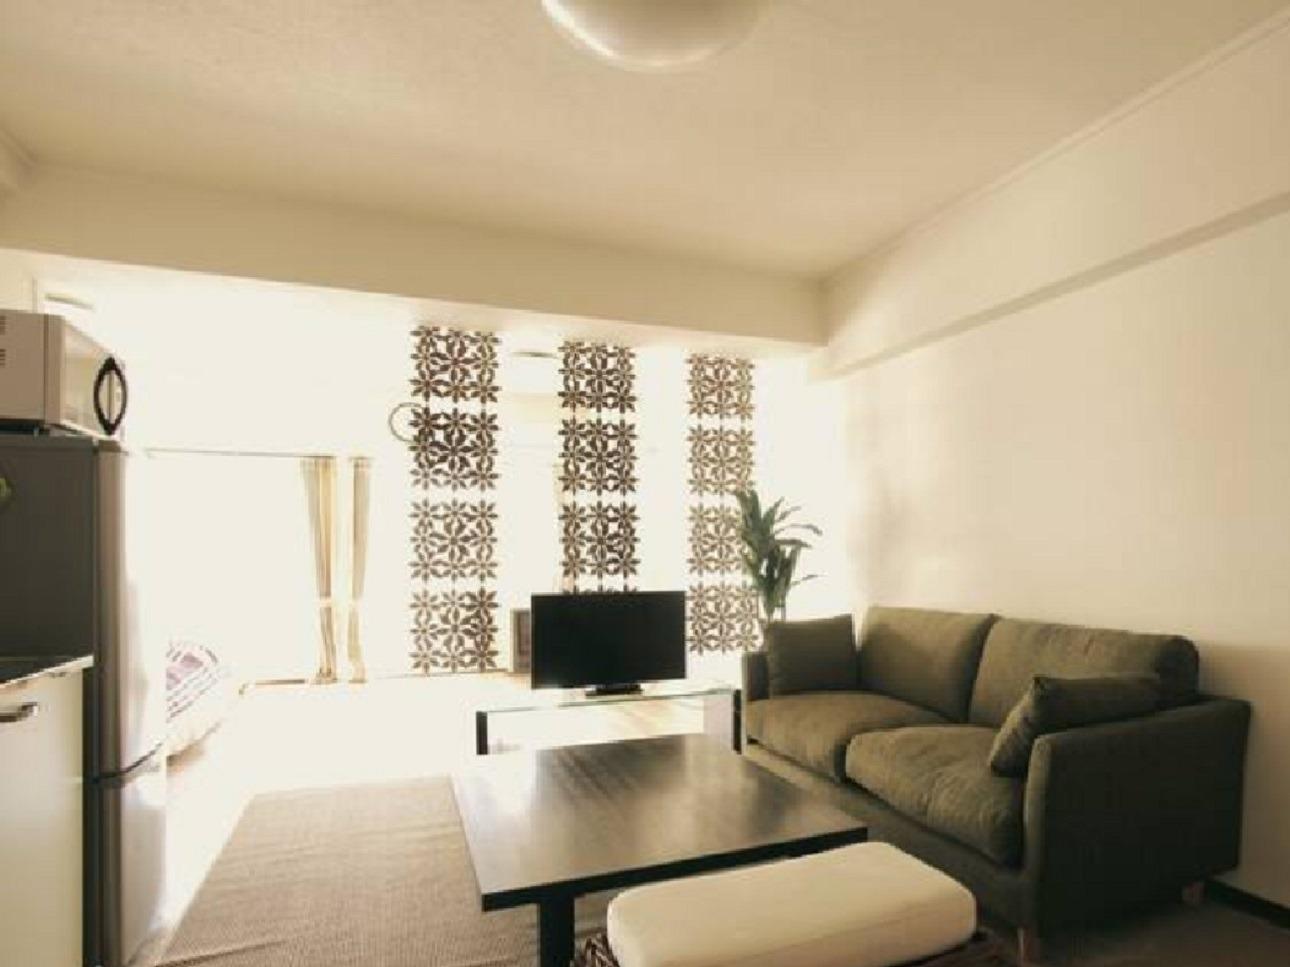 Bright and cozy room☆ 明るく過ごしやすい空間!